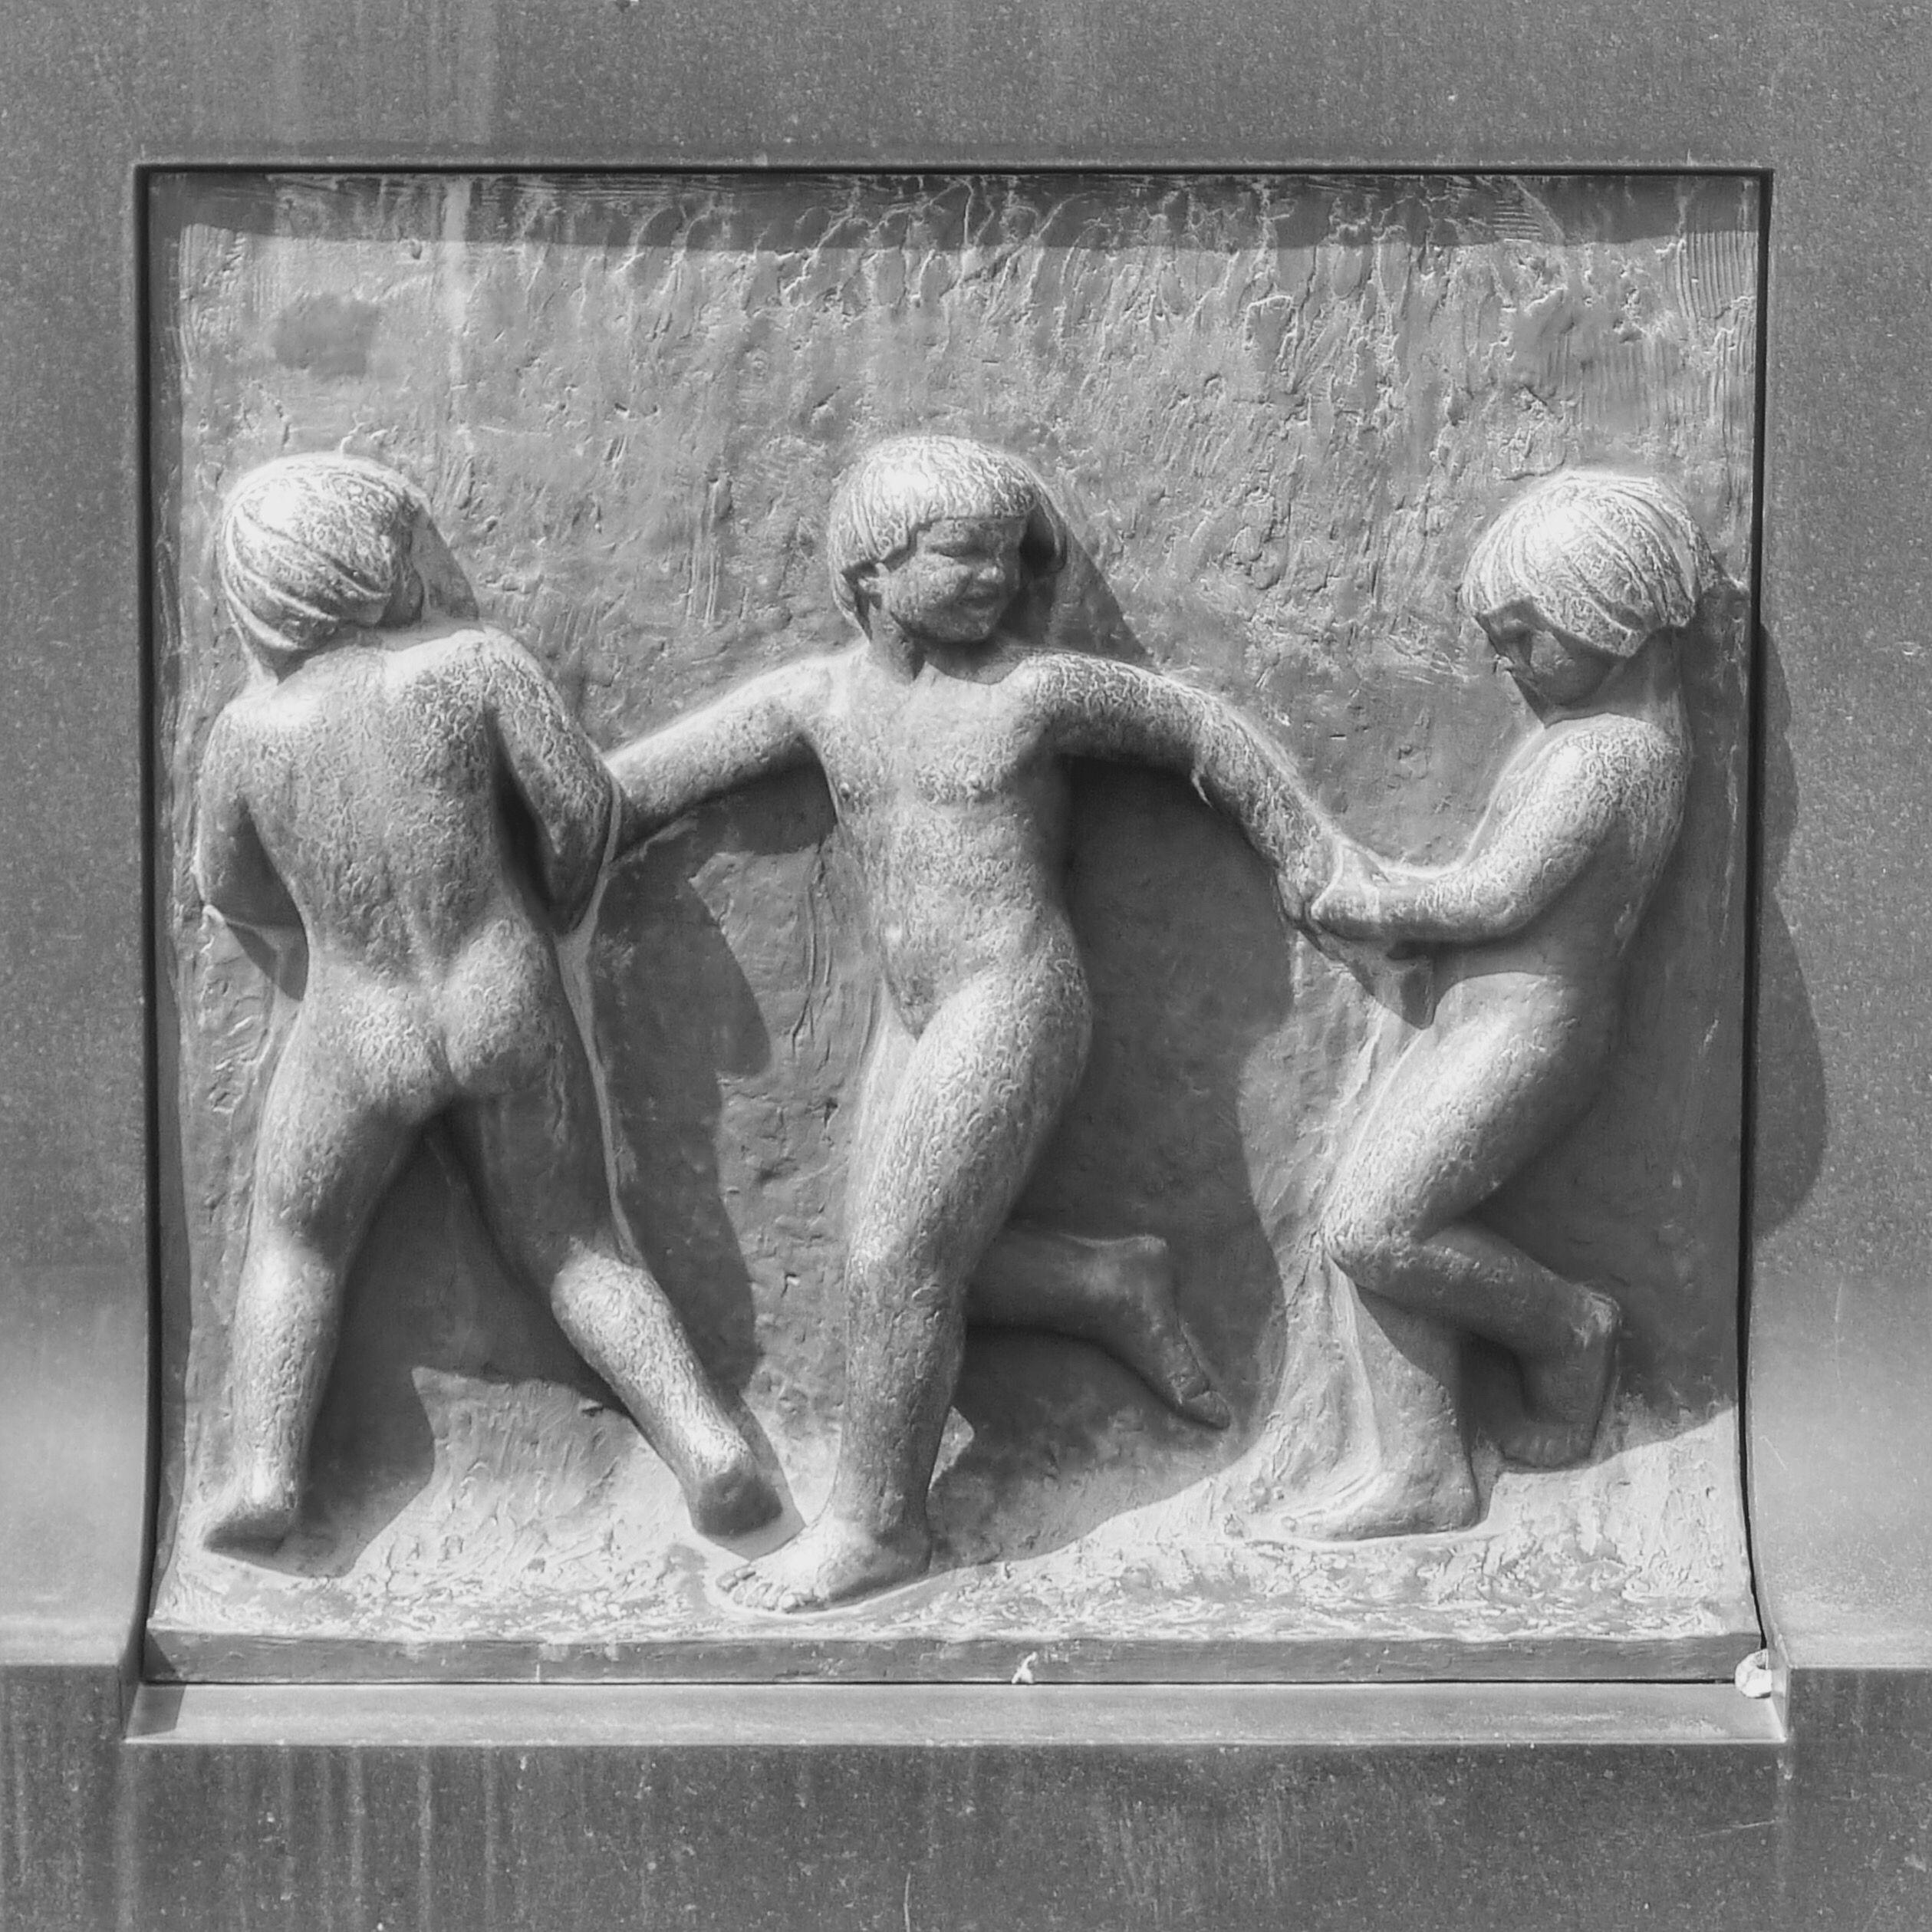 oslo | norge | frognerparken | vigelandsanlegget | bronserelieffer langs bassengets ytterside ved fontenen